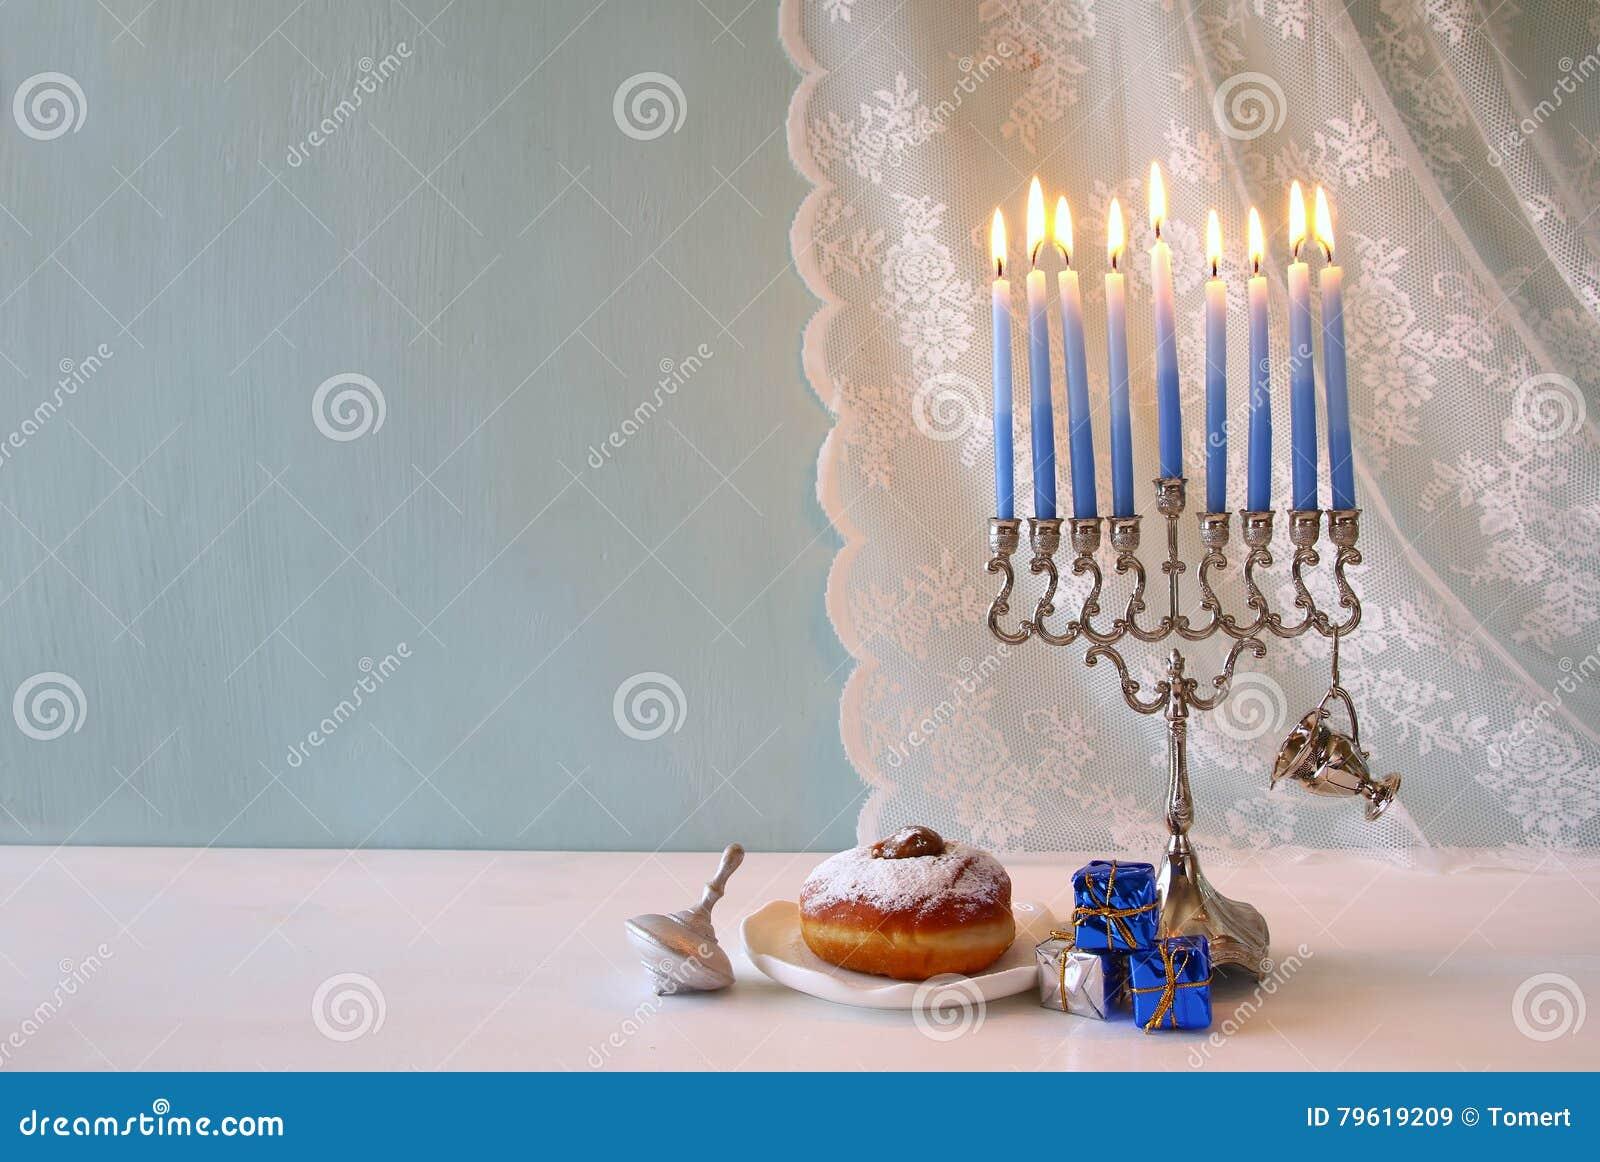 Żydowski Wakacyjny Hanukkah tło z menorah